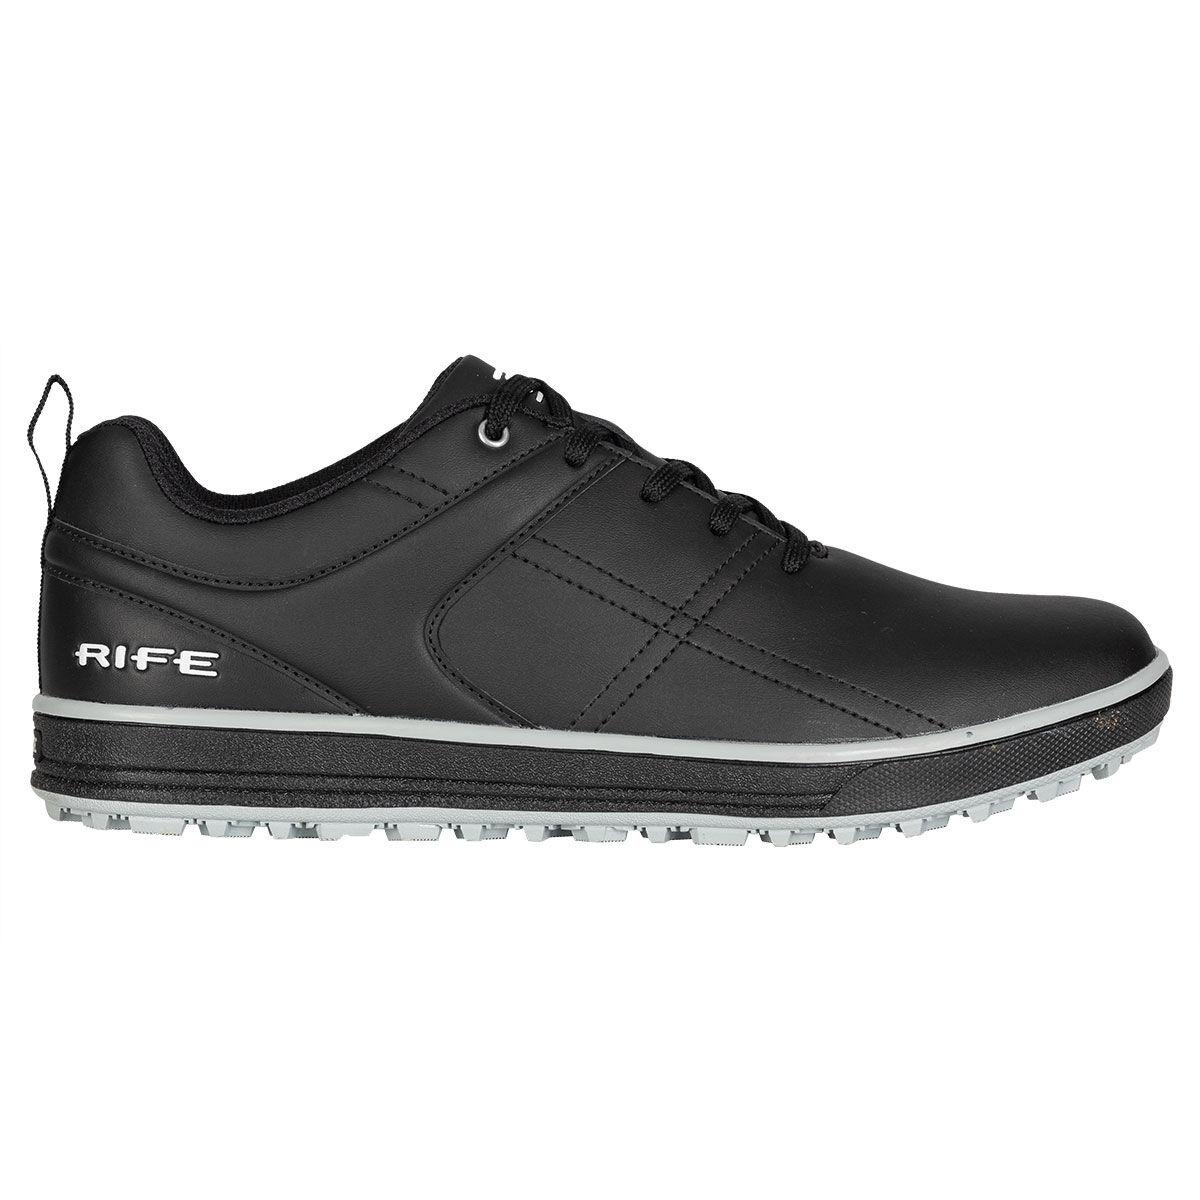 Rife RF-01 Pro-Approach Spikeless Golf Shoes, Male, Black/white, 10, Regular